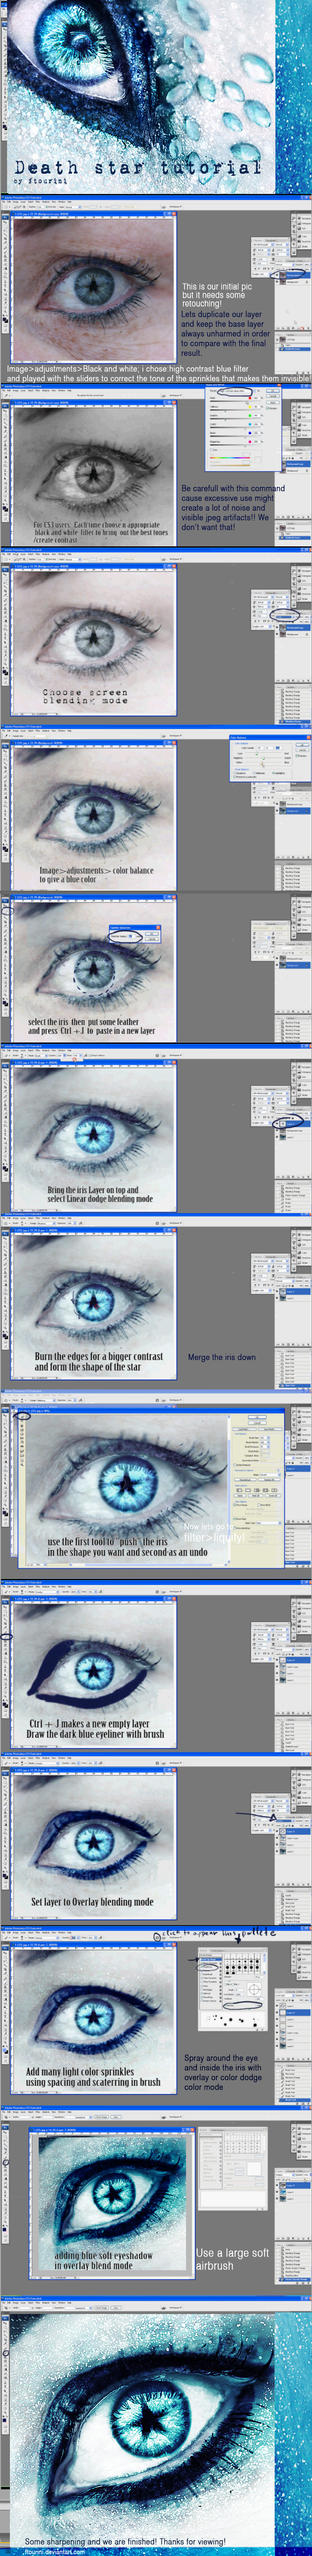 eye tutorial- death star by ftourini